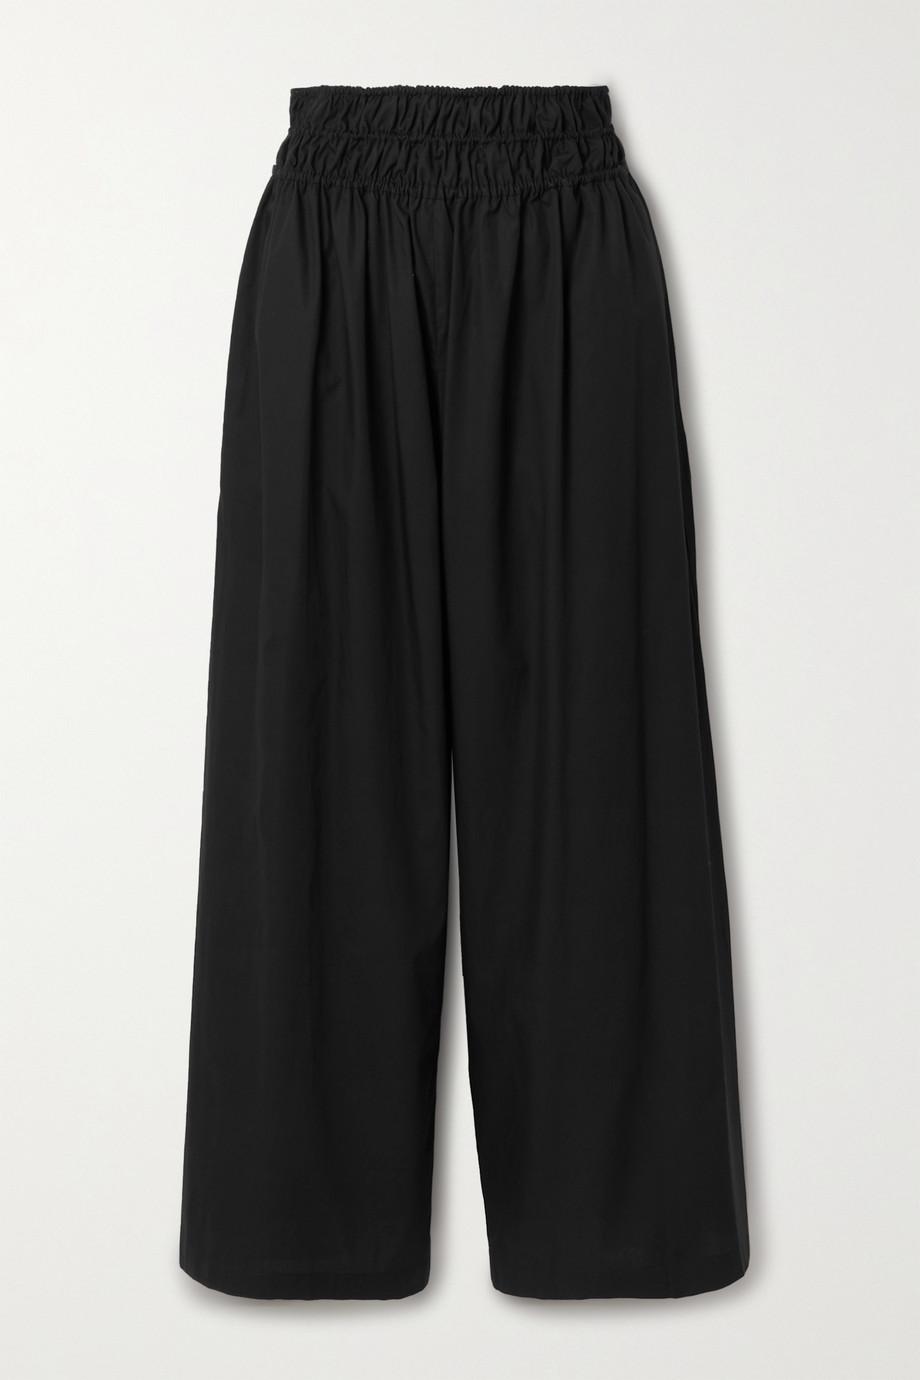 Rosetta Getty Gathered cotton-poplin wide-leg pants